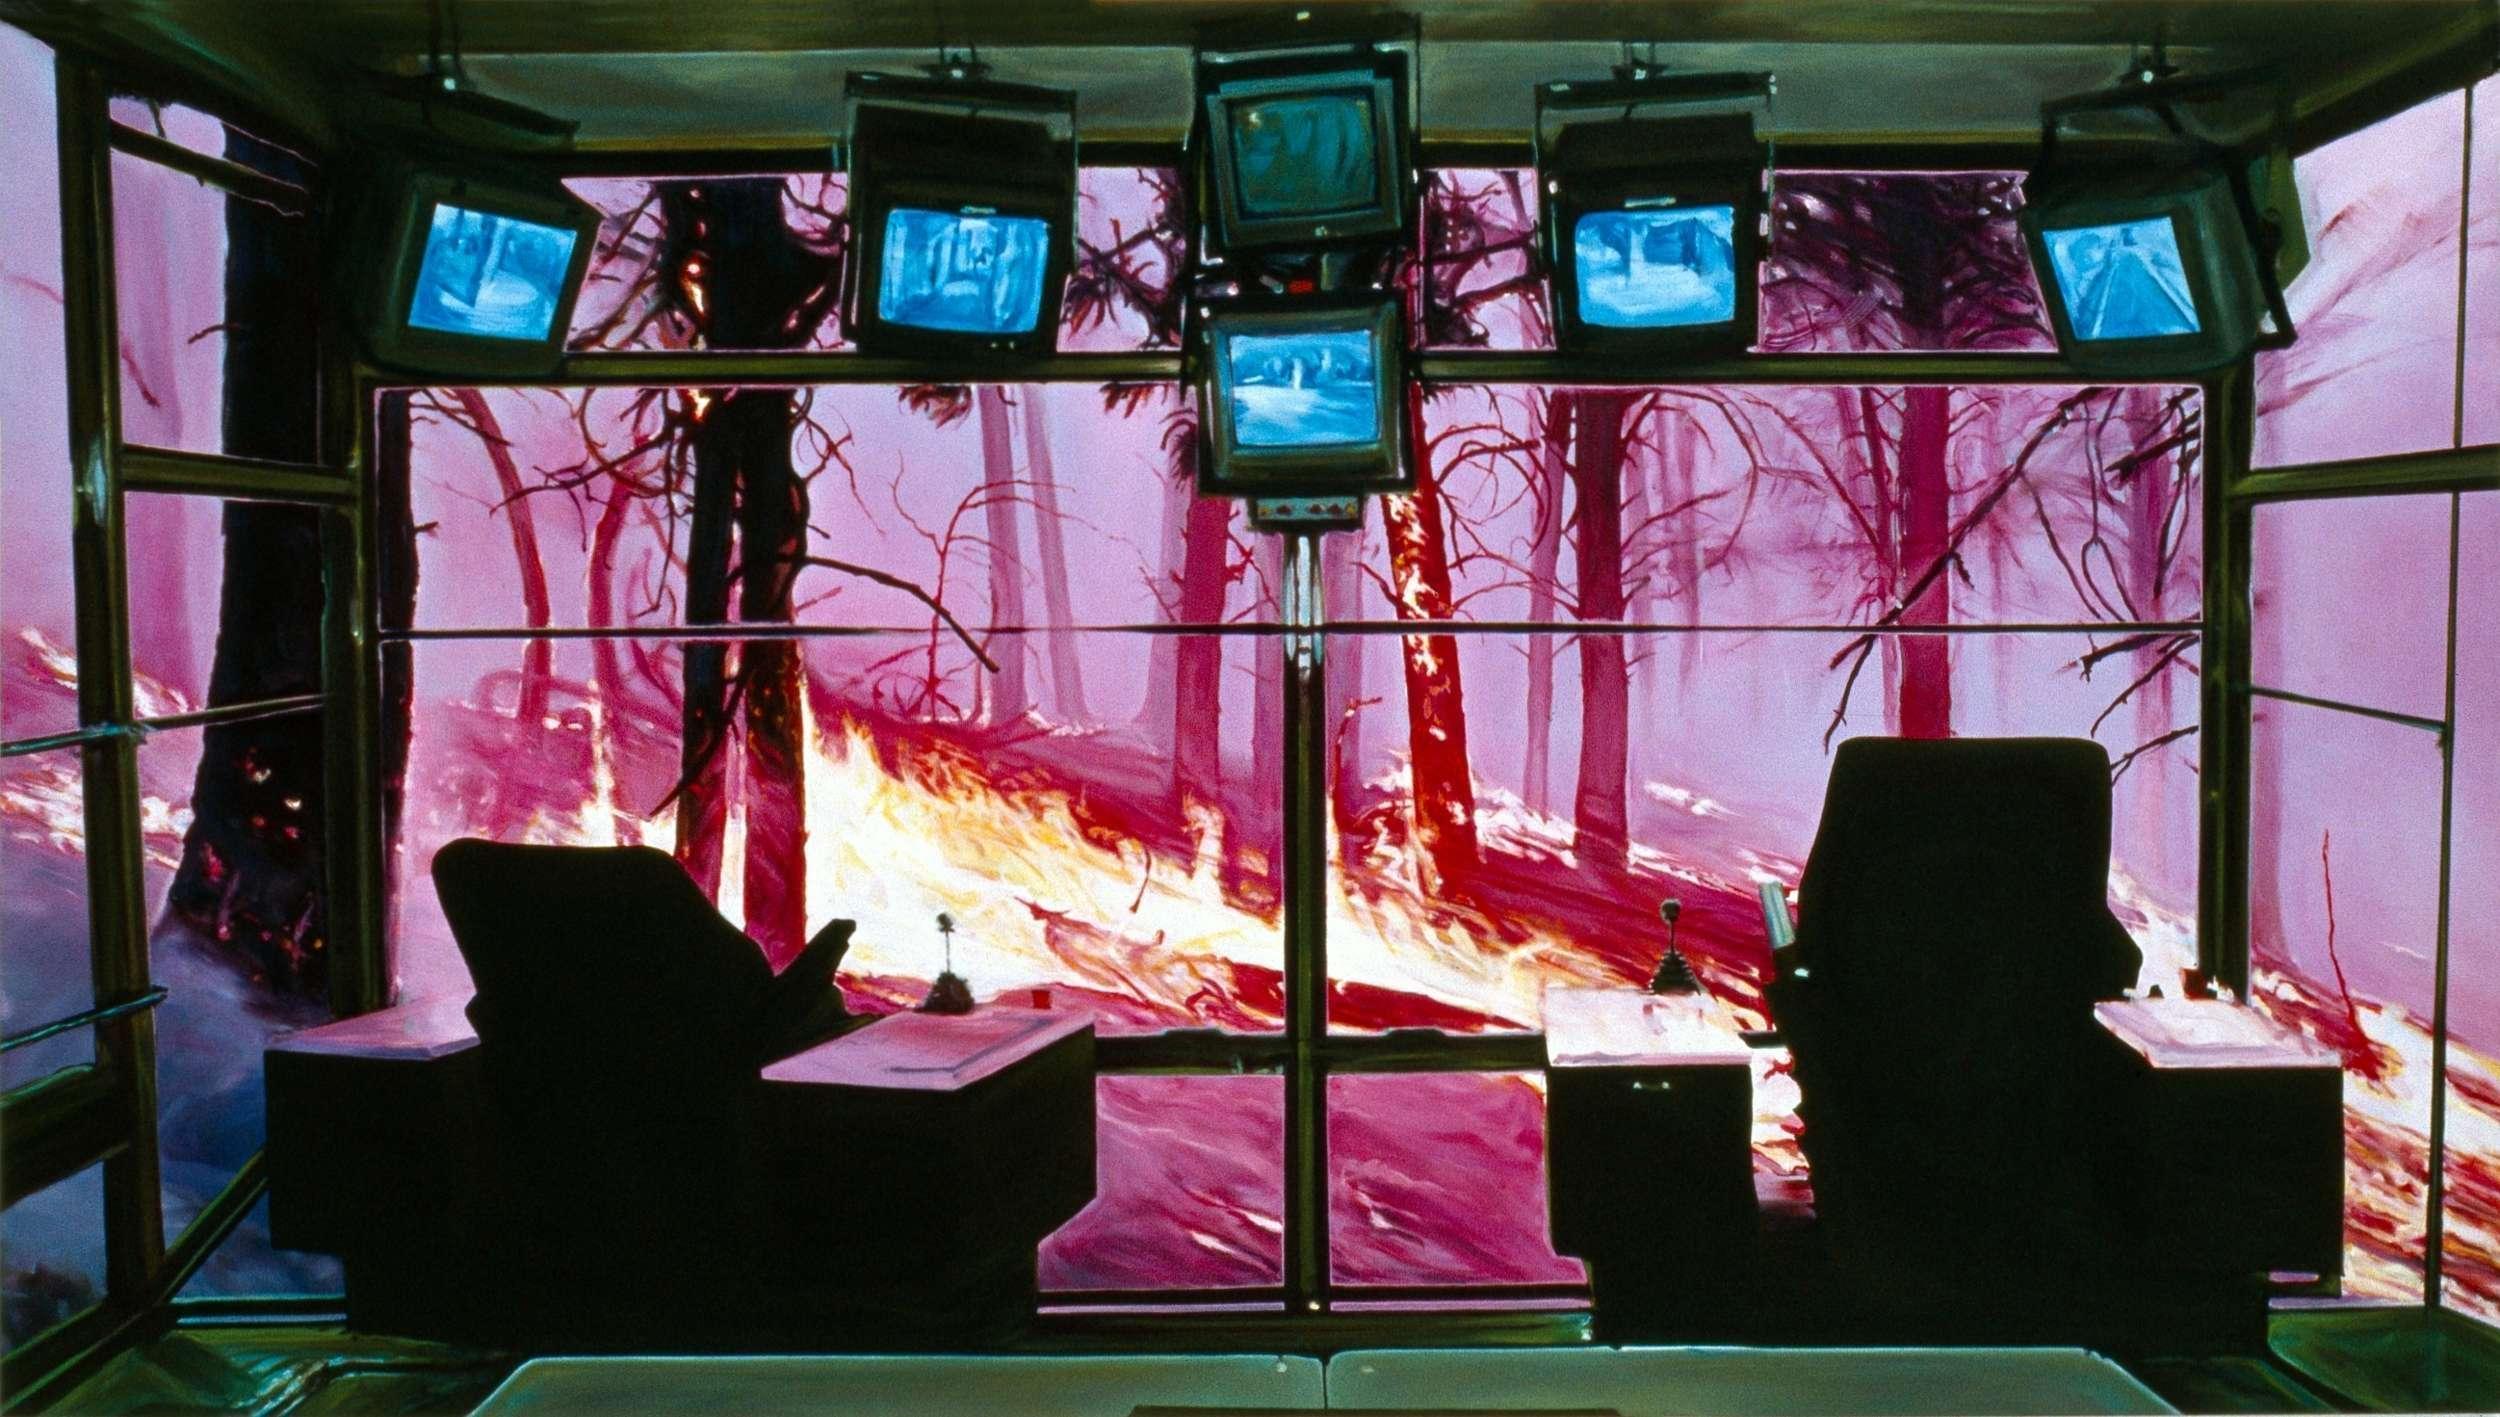 Frontier, 2001, 112 x 198cm, oil on linen